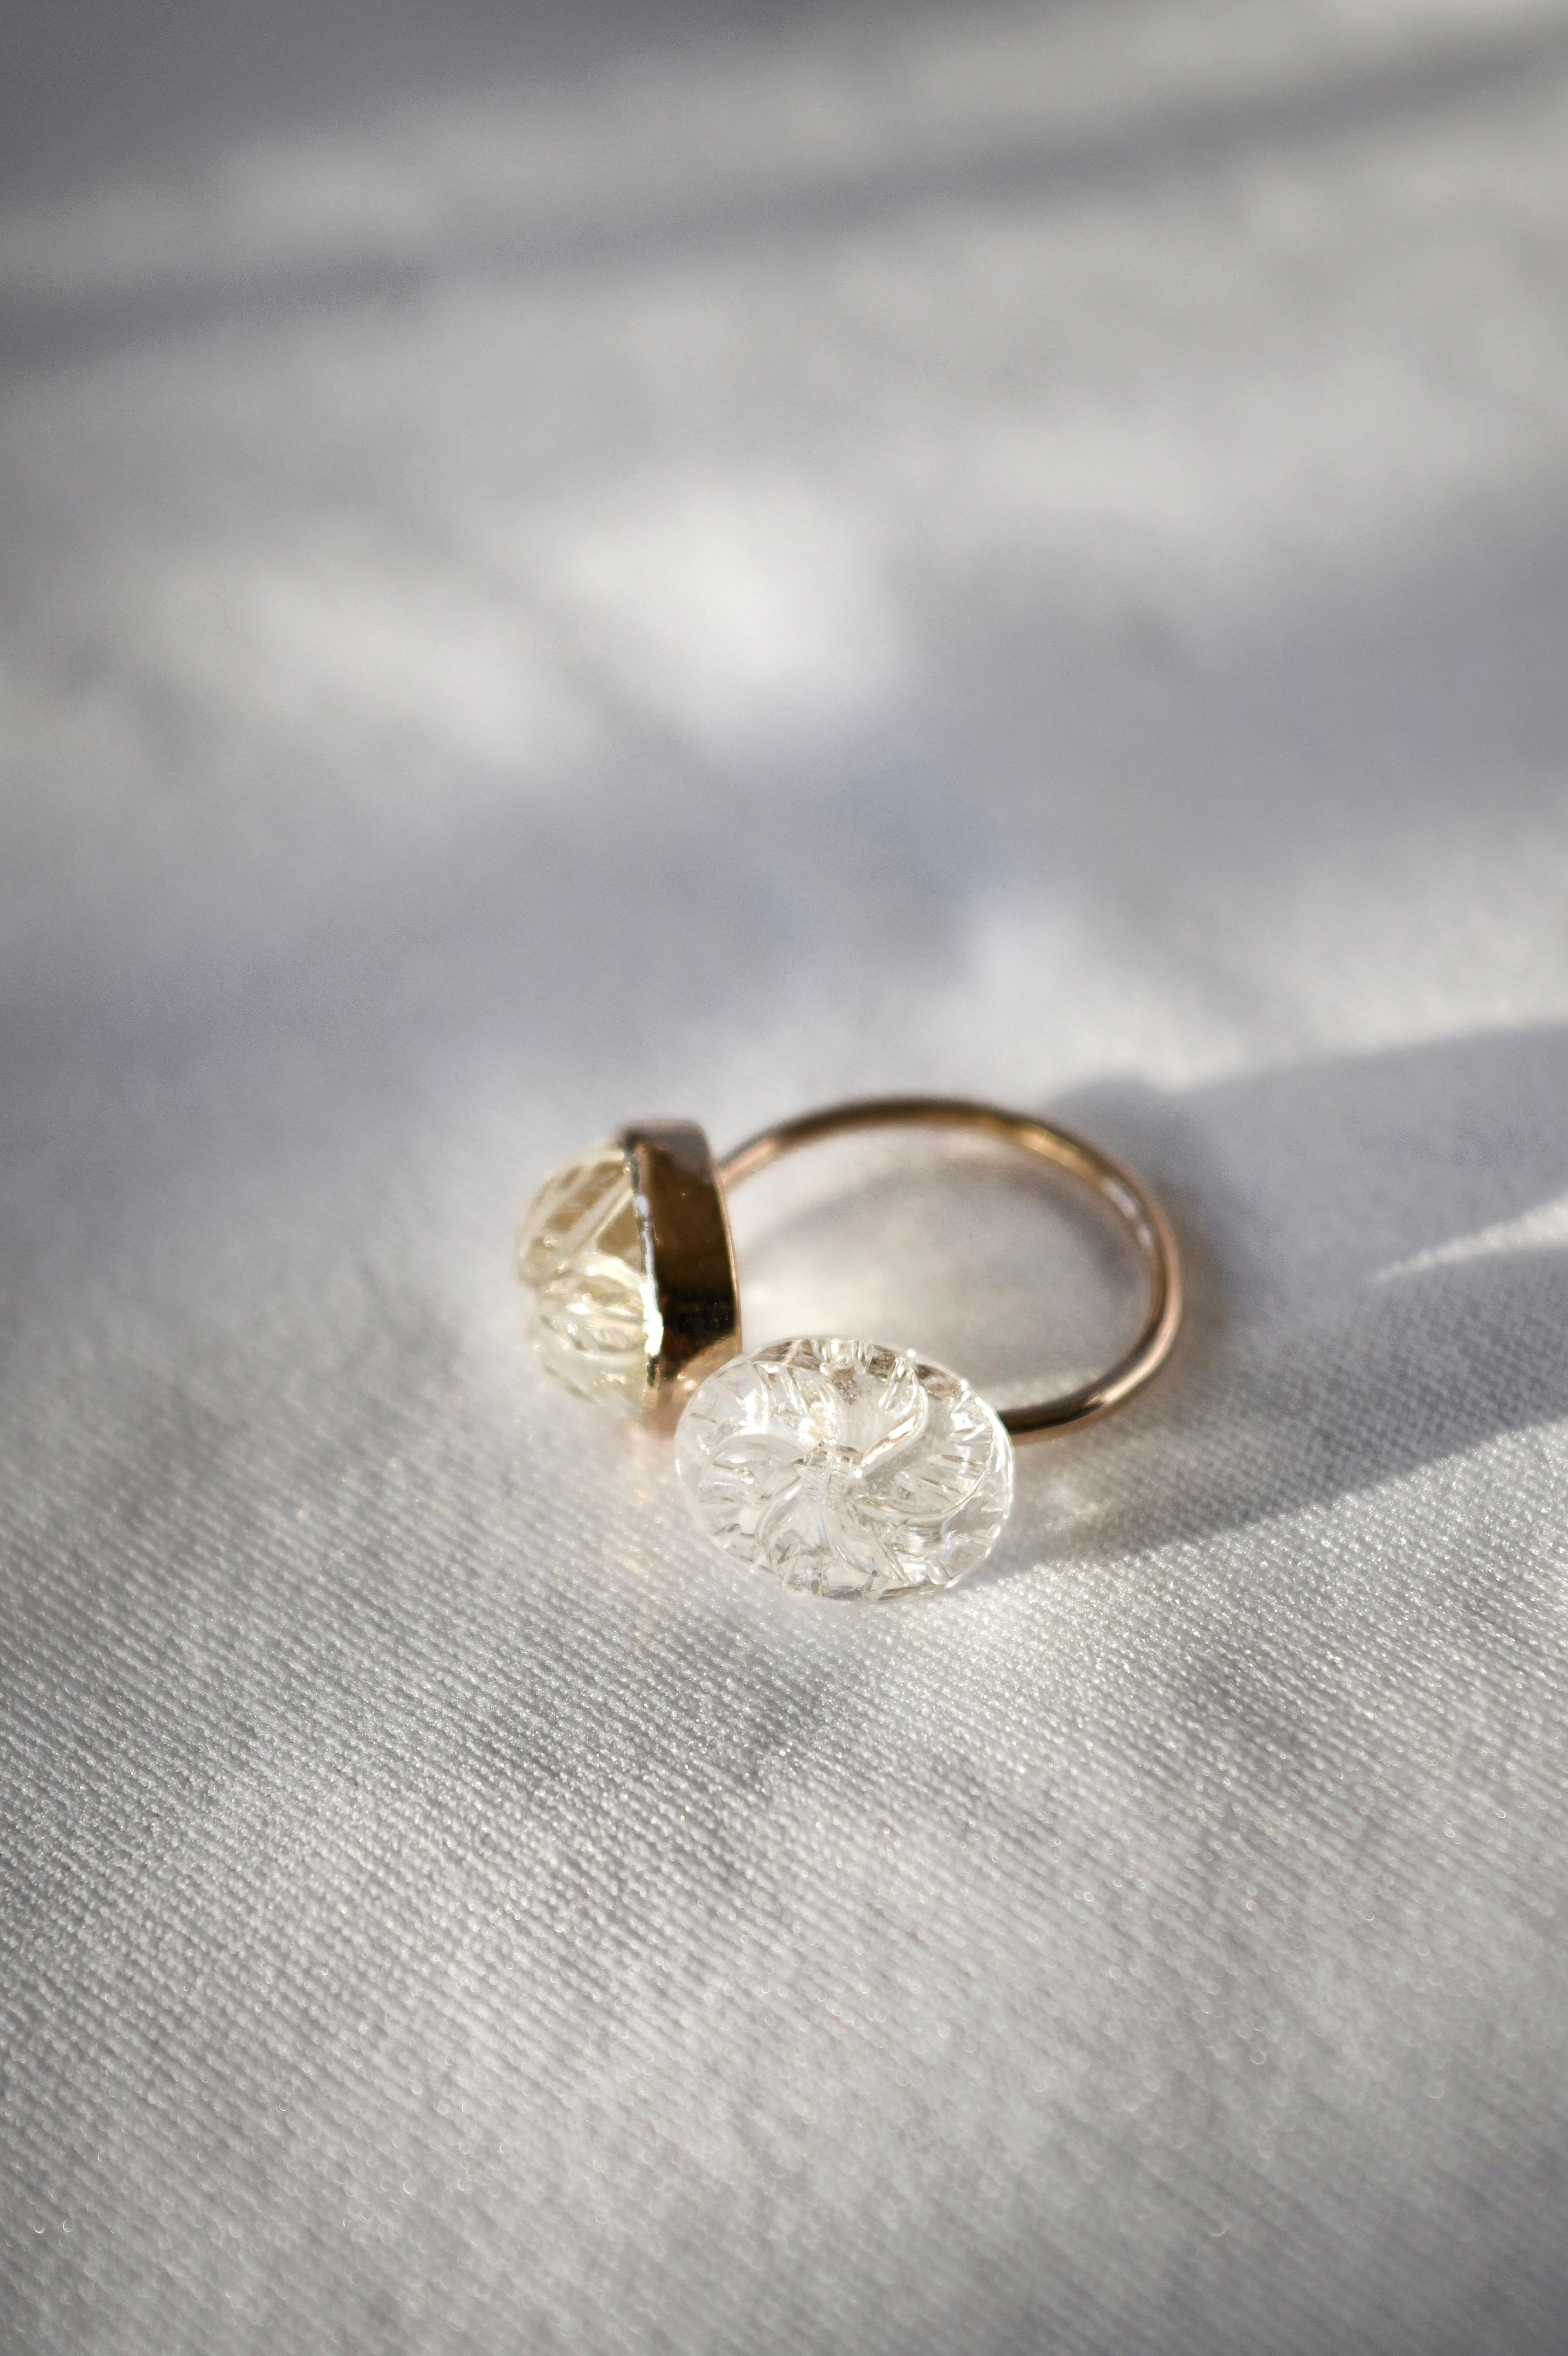 K10 Carving Quartz Ring 10金カービング水晶リング